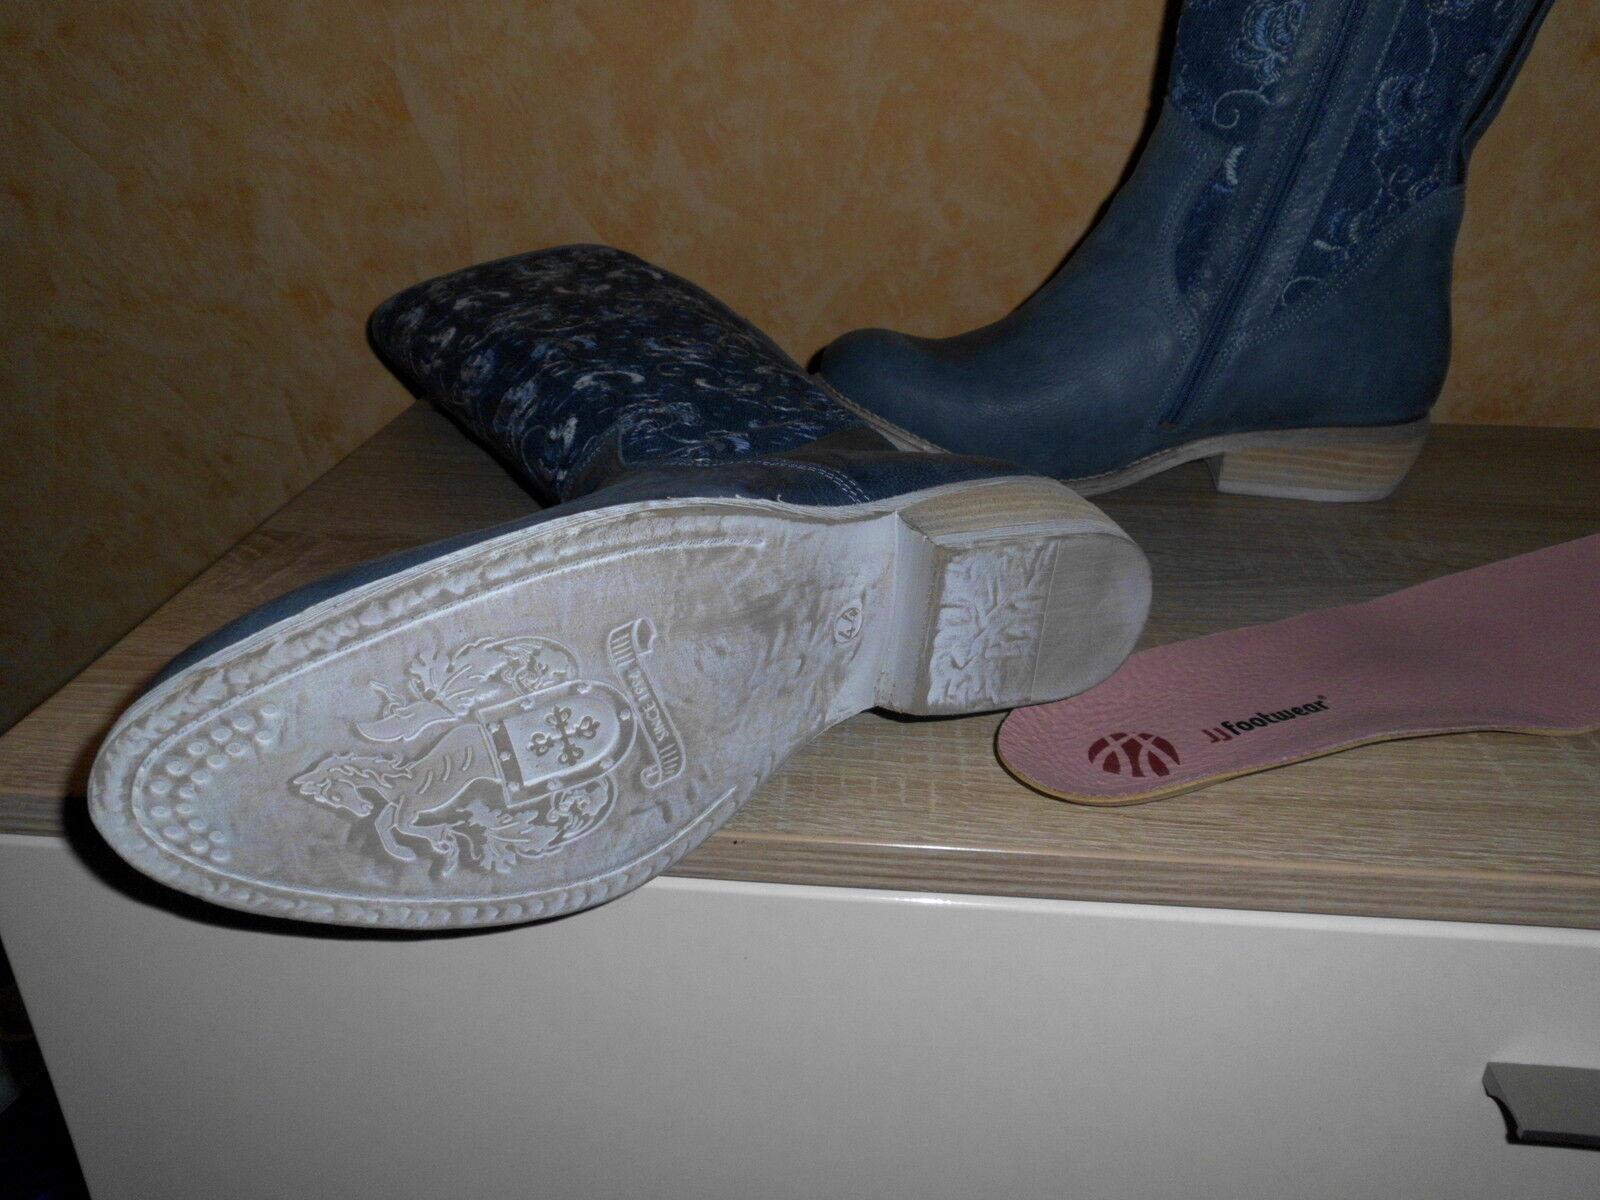 JJ Footwear Gr. XXL Weitschaft Stiefel Alexandria in kobaltblau NEU Gr. Footwear 44 JJFW chic c7543f